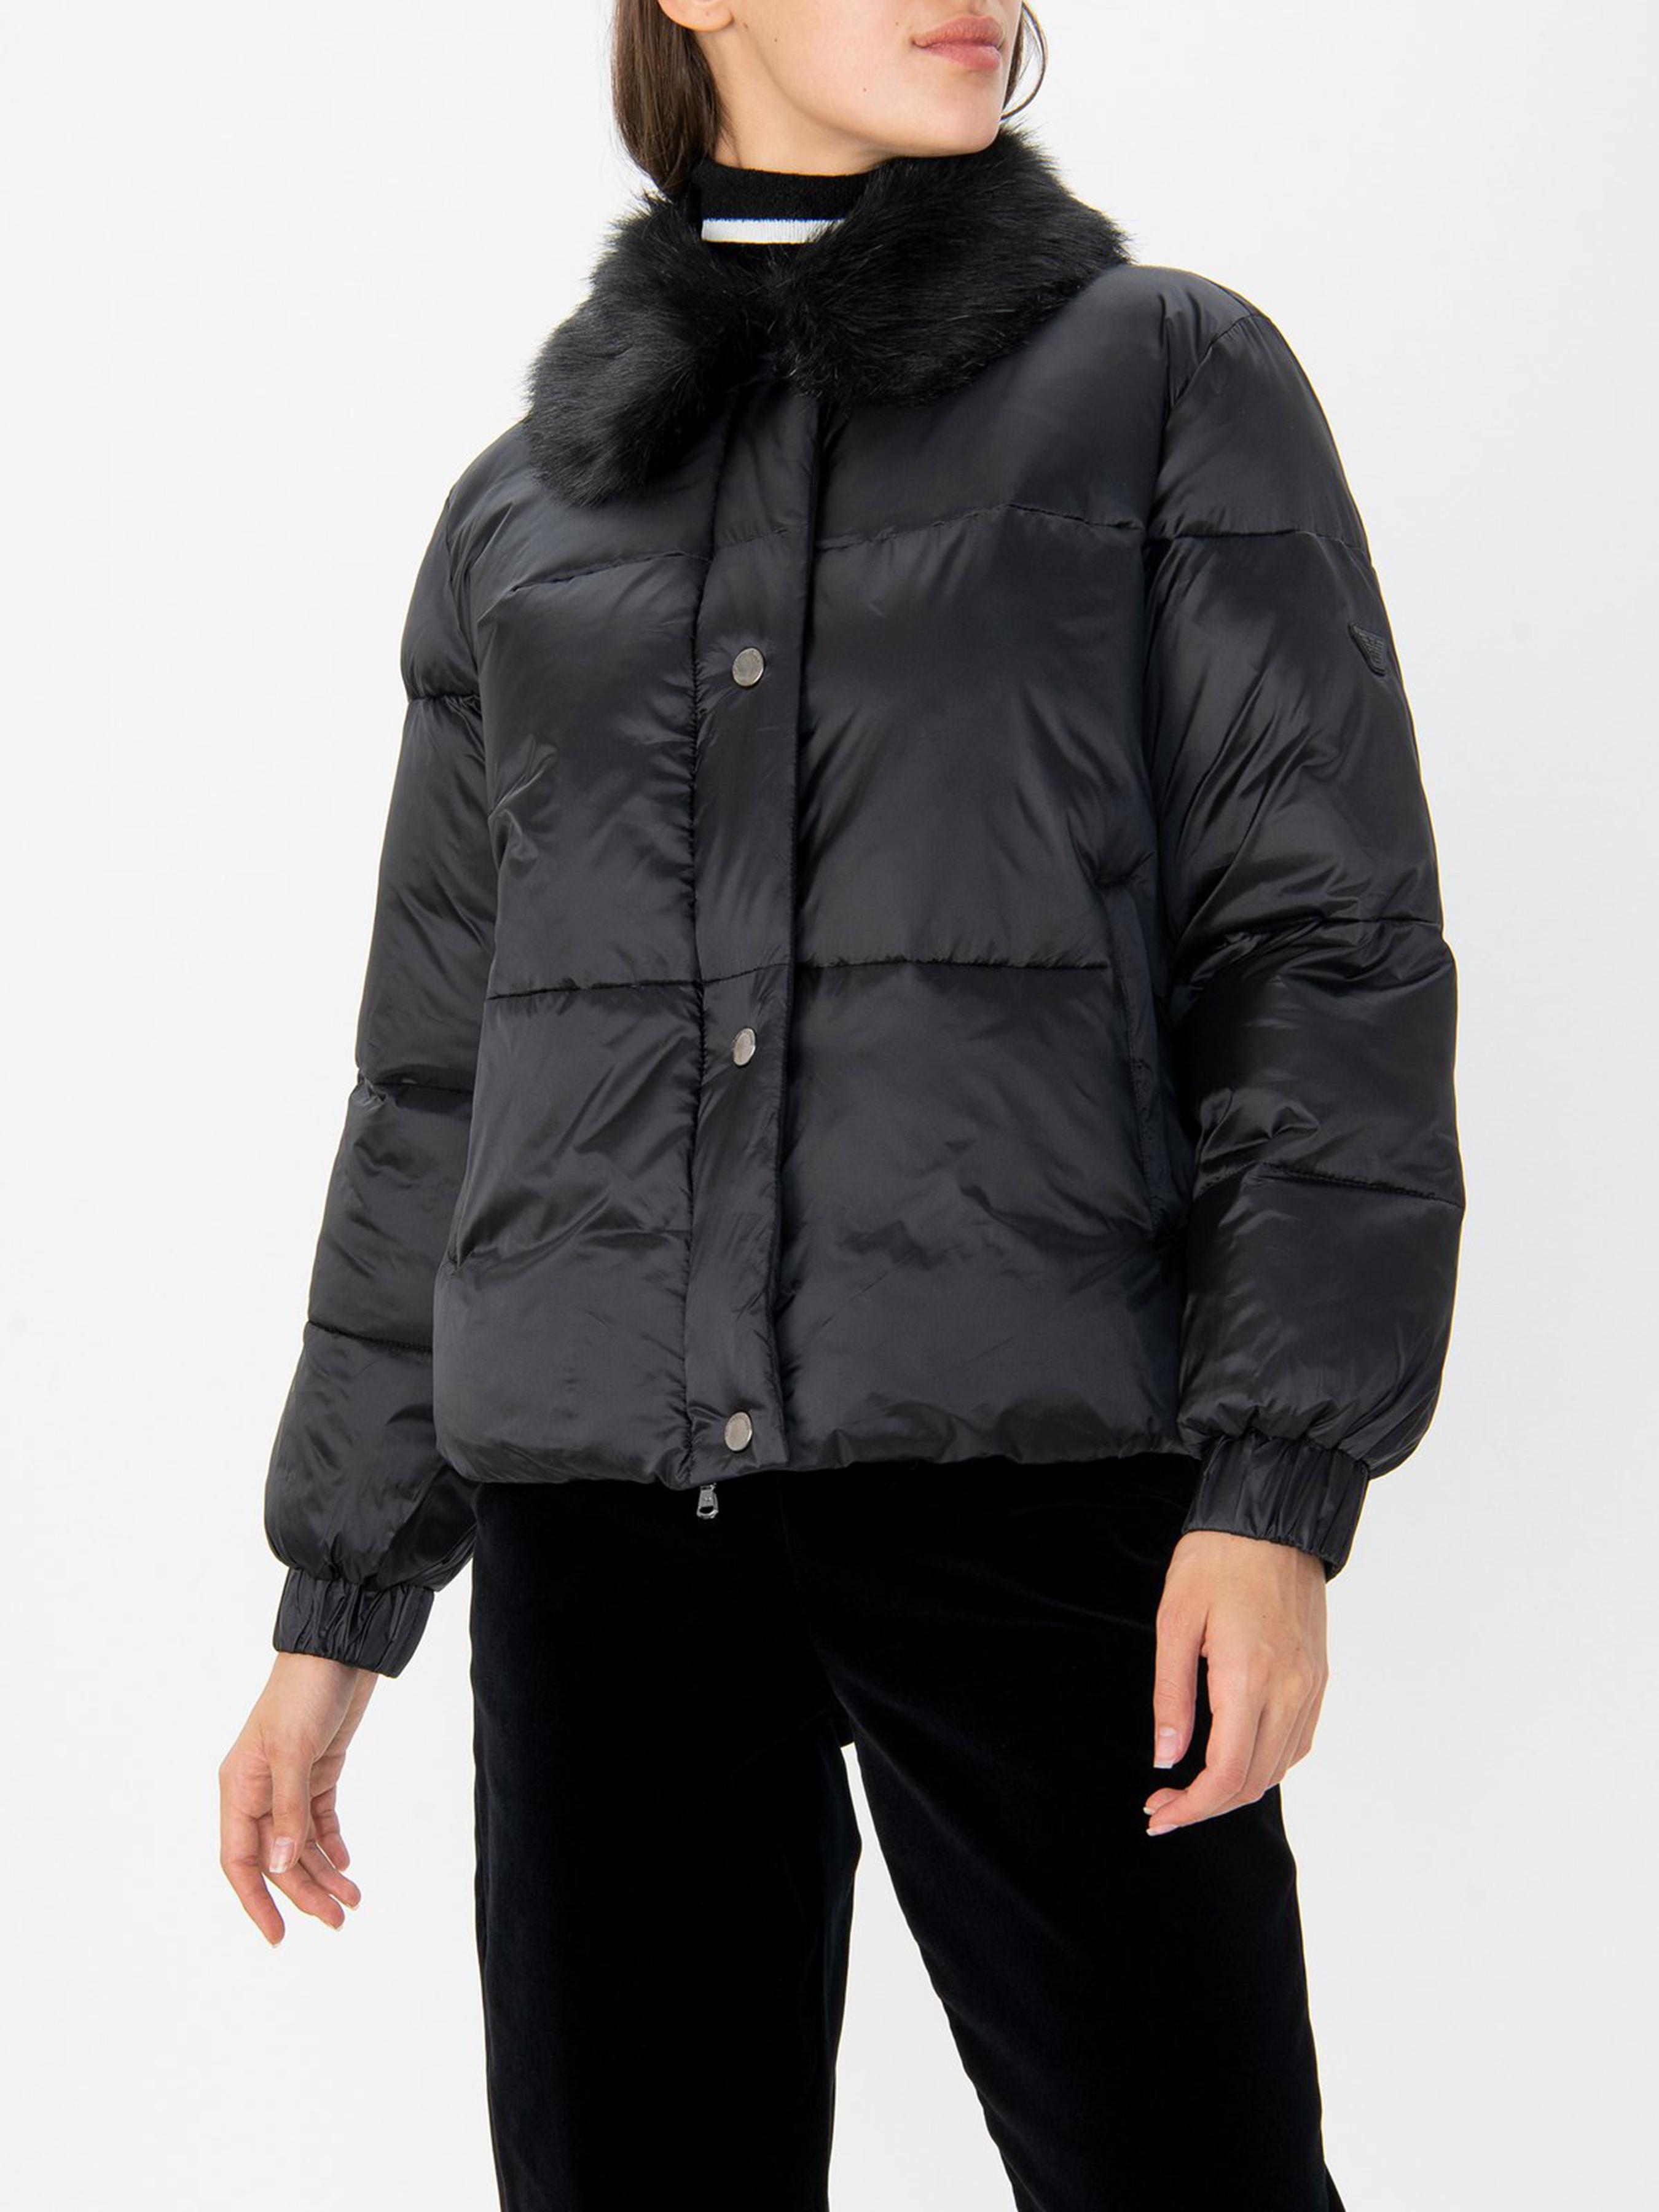 Куртка женские Emporio Armani модель 5P665 отзывы, 2017